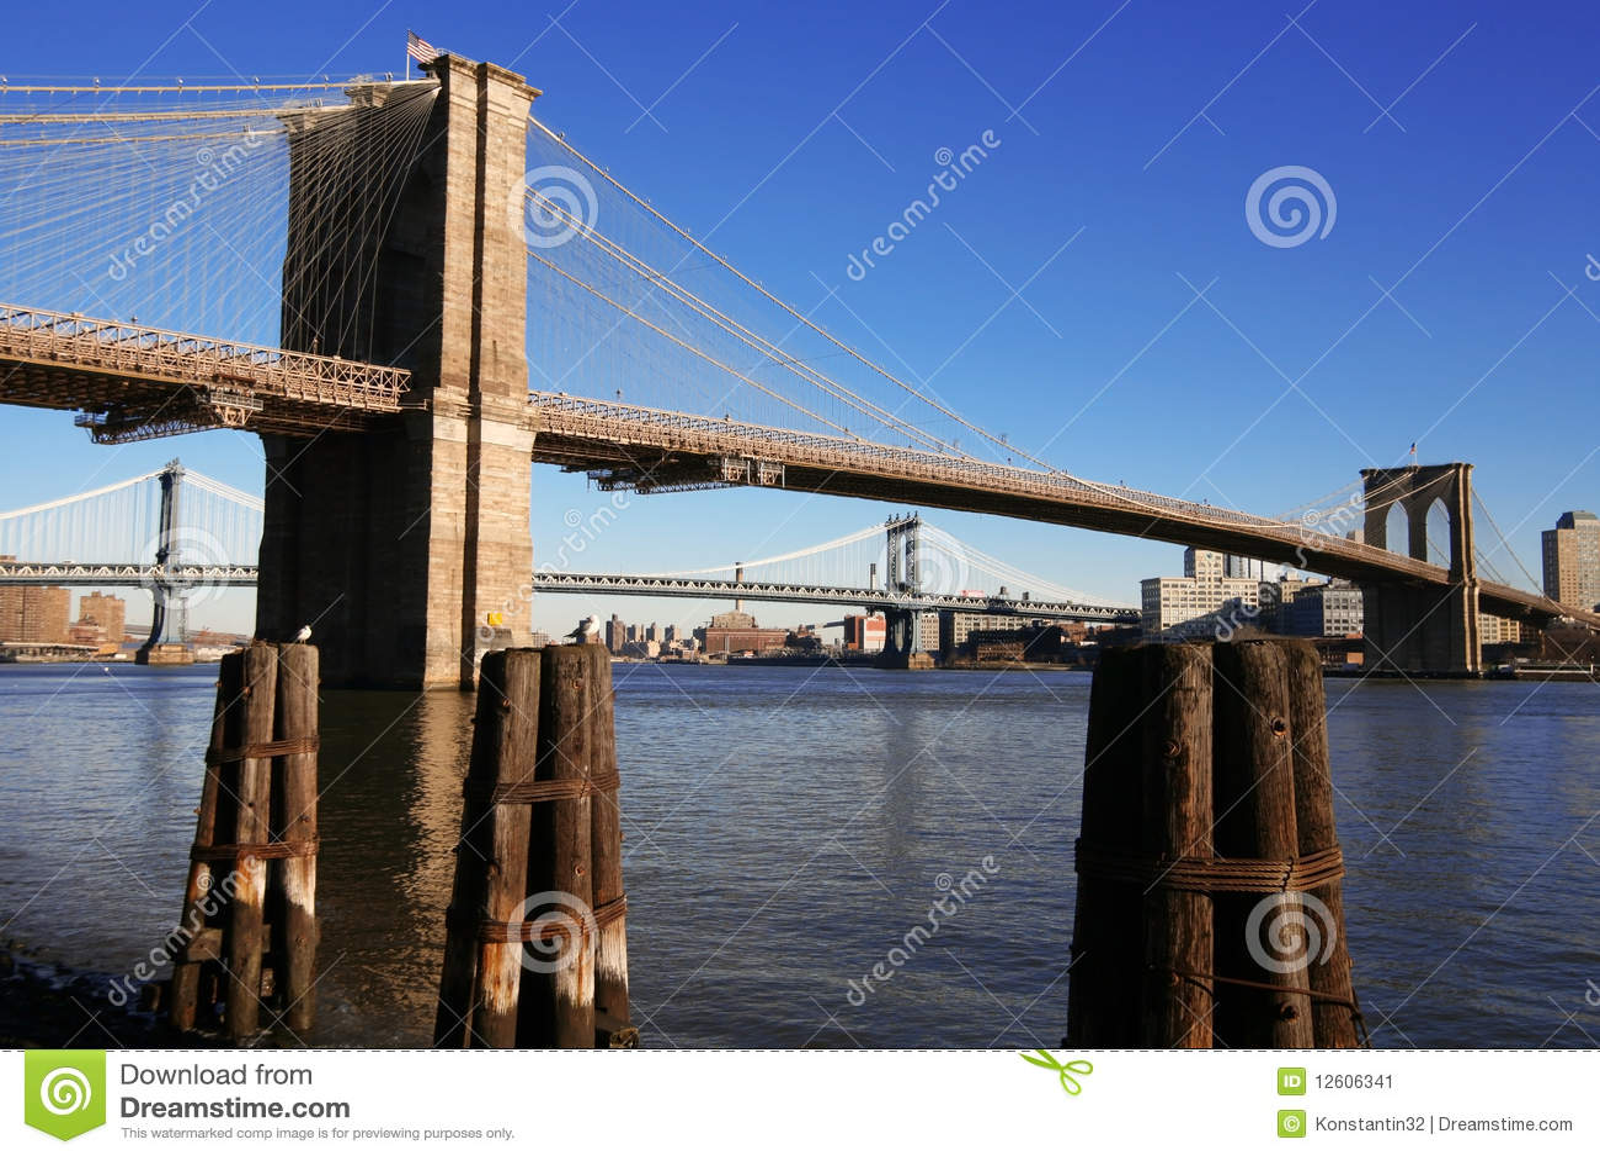 Classical NY - Brooklyn bridge